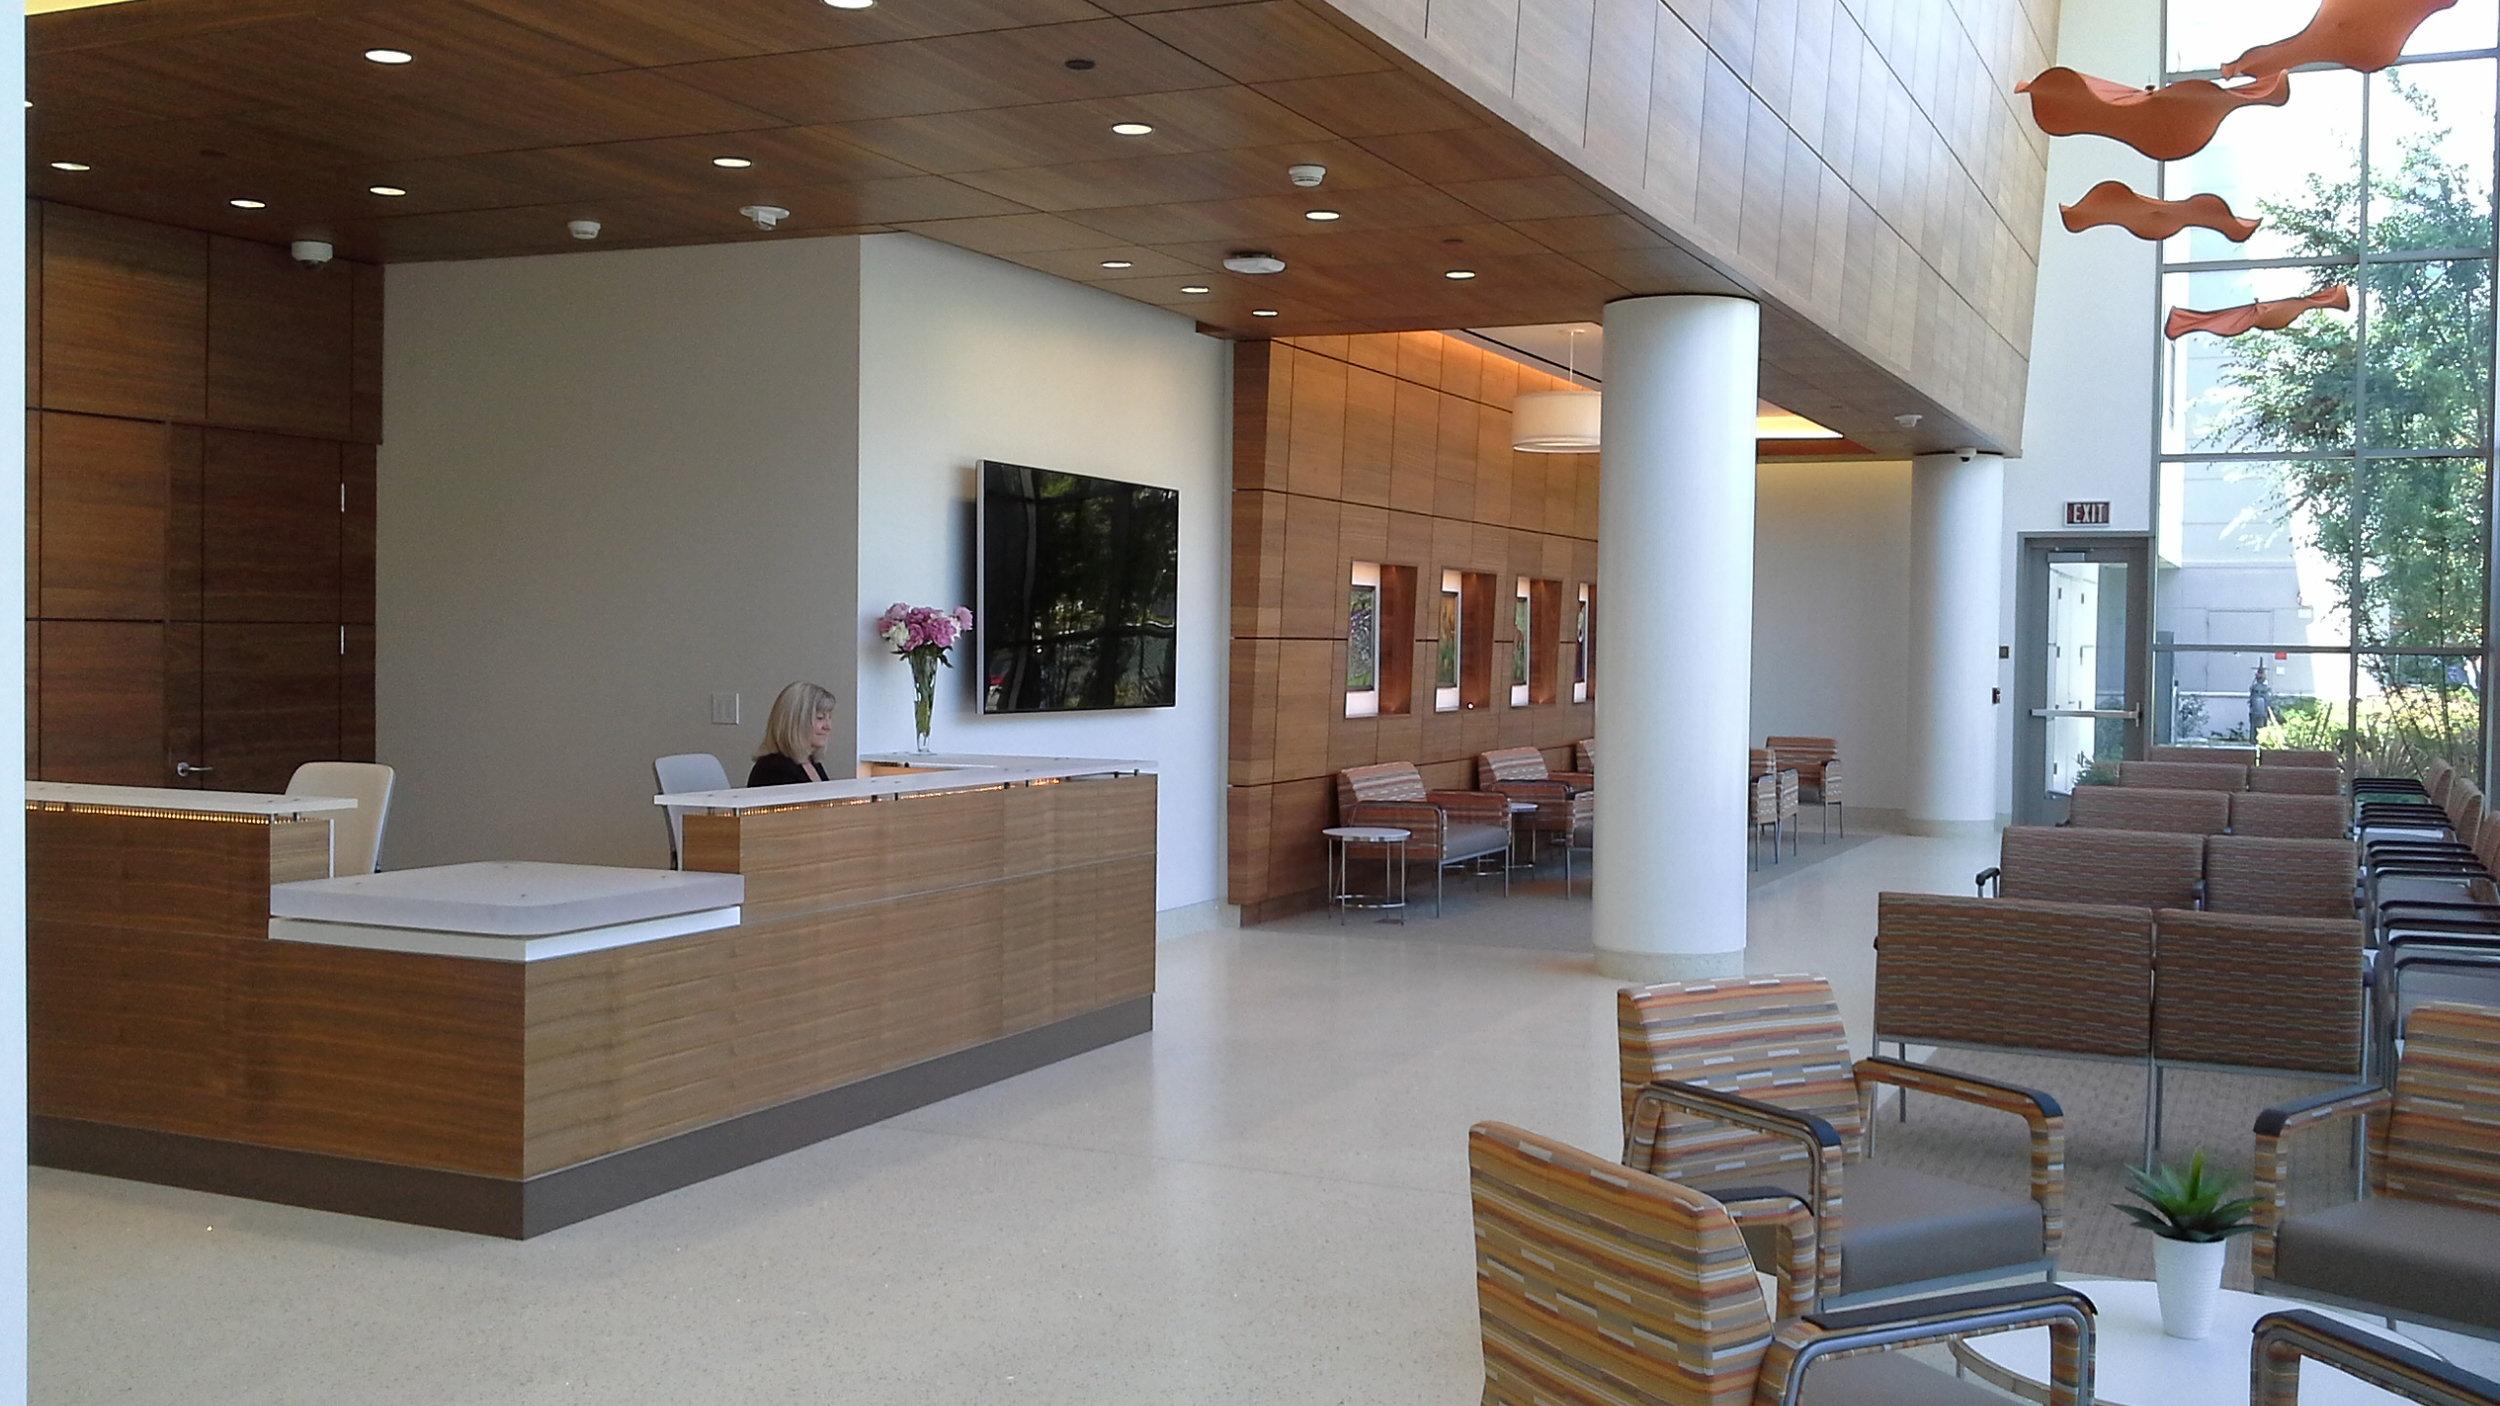 UC Irvine Health H.H. Chao Comprehensive Digestive Disease Center